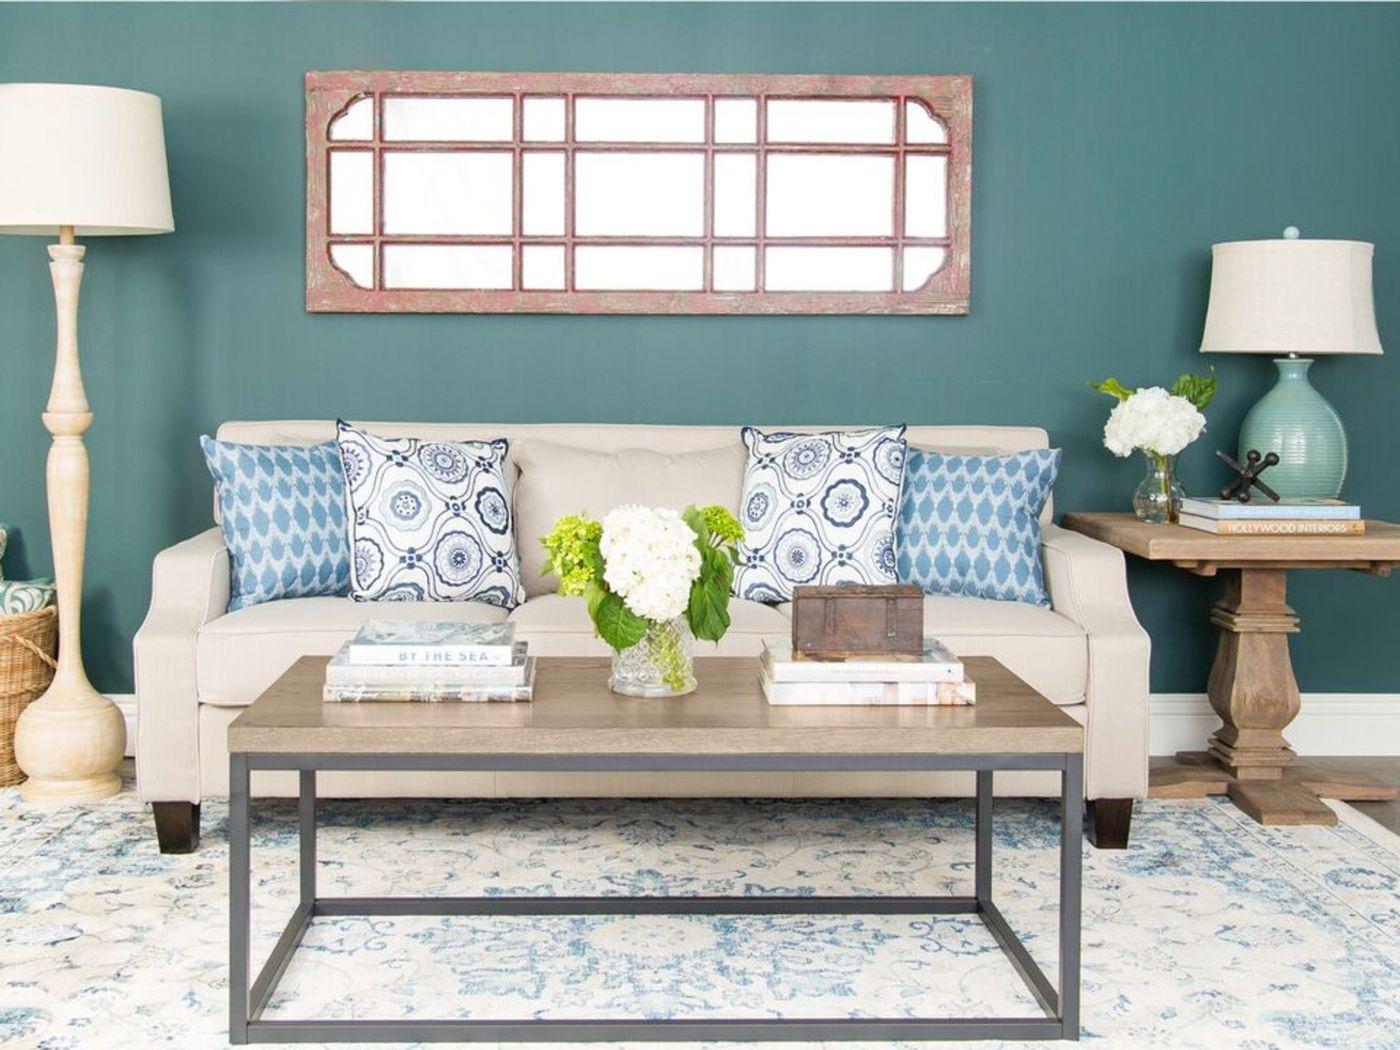 100 Online Interior Design Jobs From Home Online